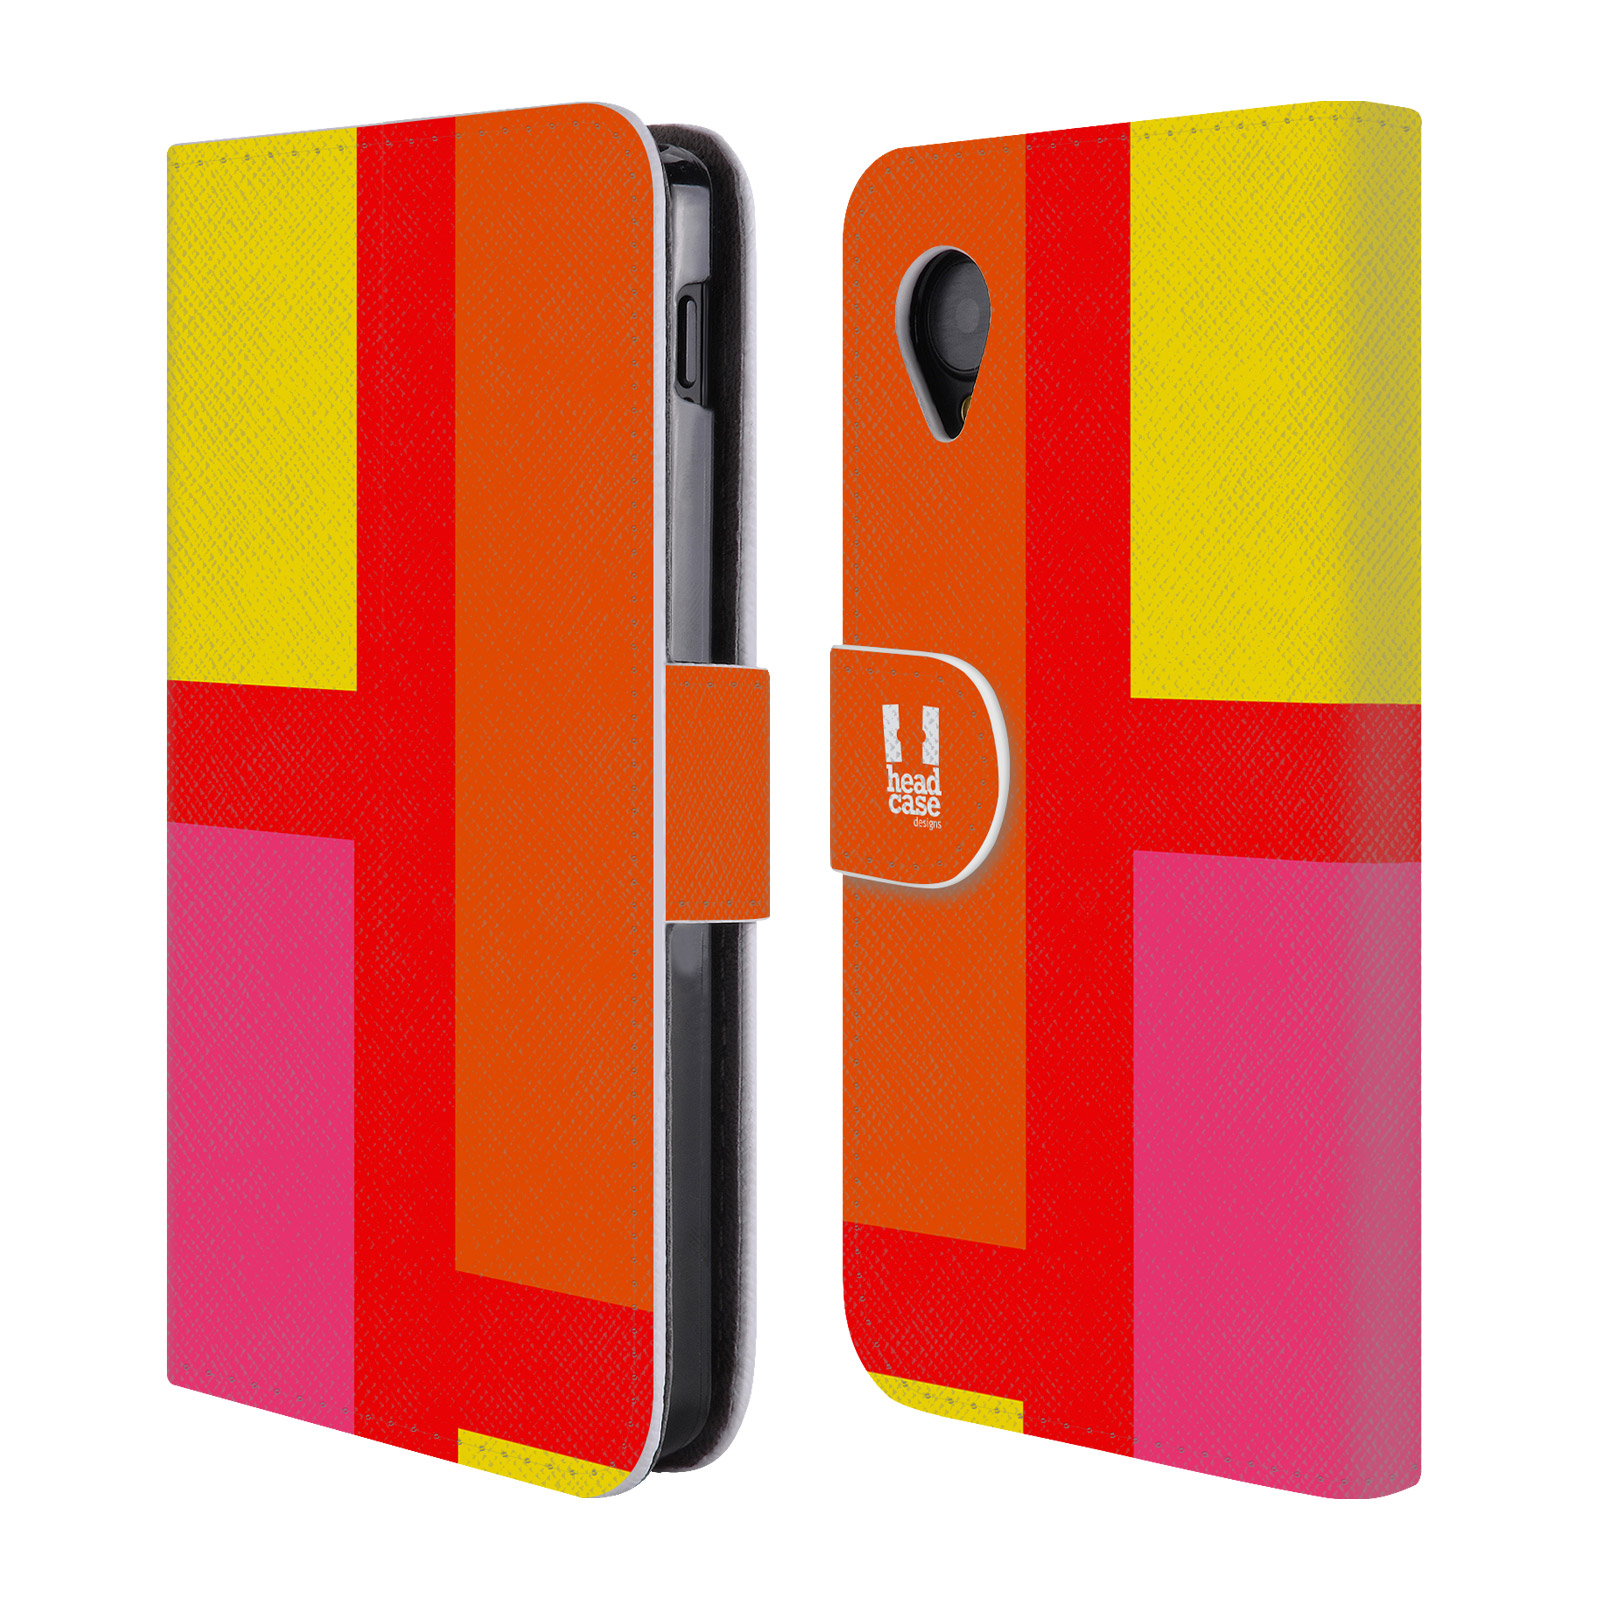 HEAD CASE Flipové pouzdro pro mobil LG GOOGLE NEXUS 5 barevné tvary oranžová ulice